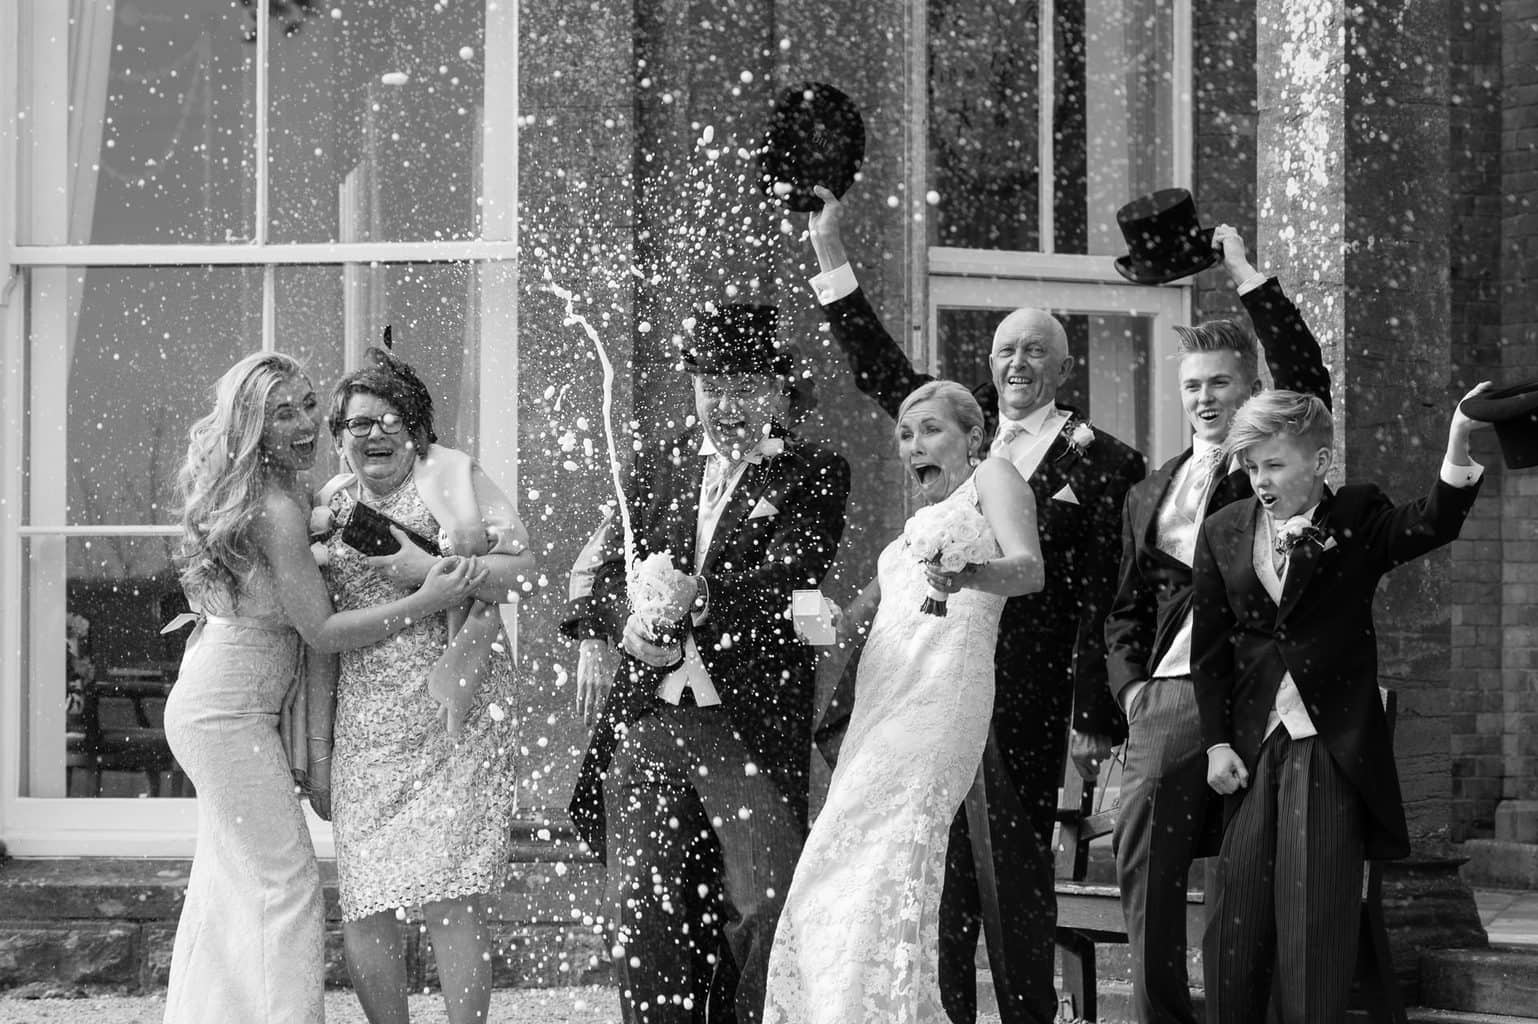 Wedding Photography Champagne photo